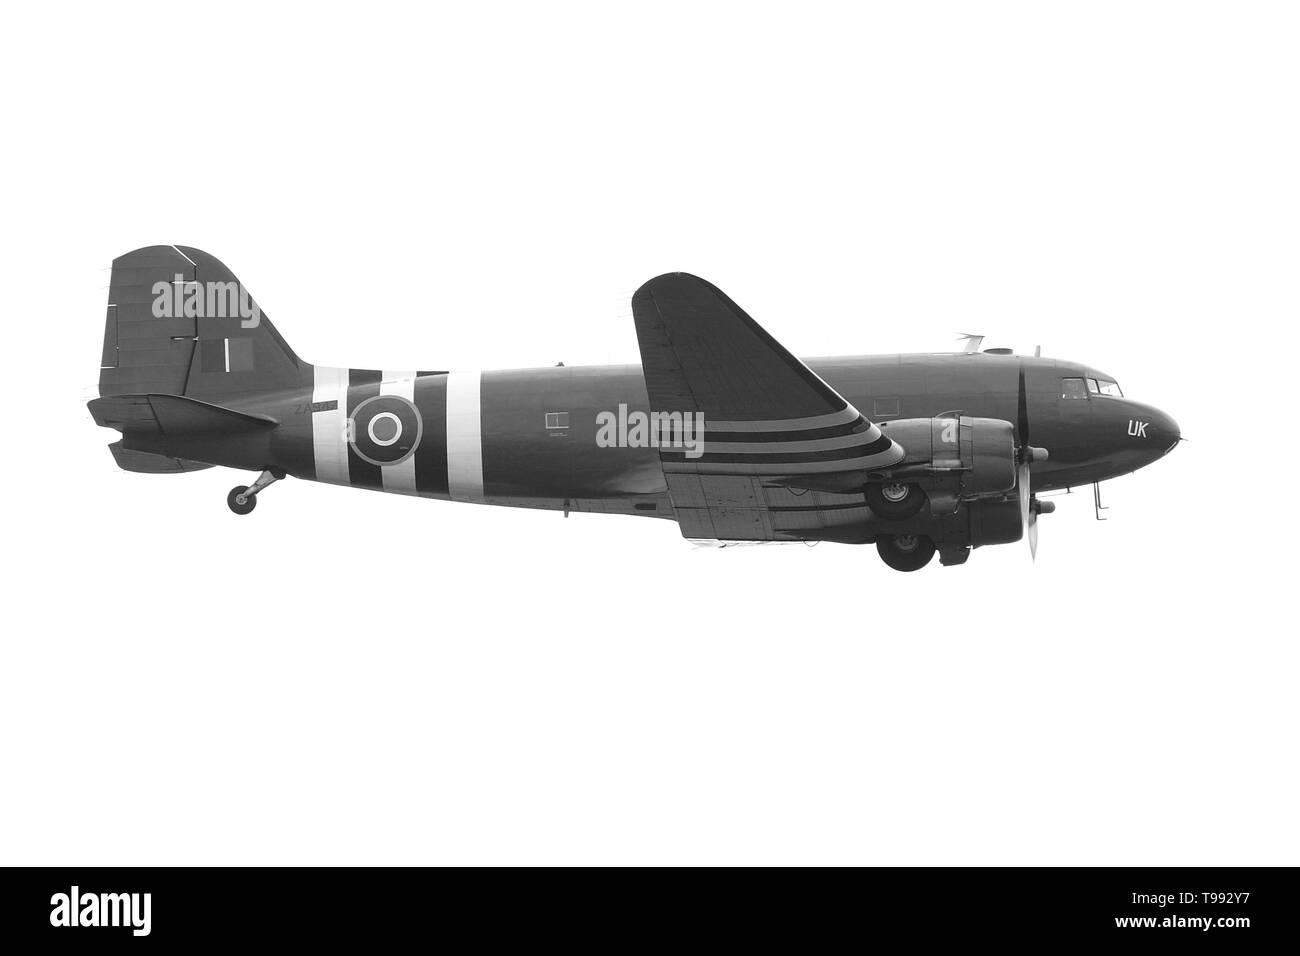 RAF Douglas Dakota, C-47,  D-day 1944 - Stock Image